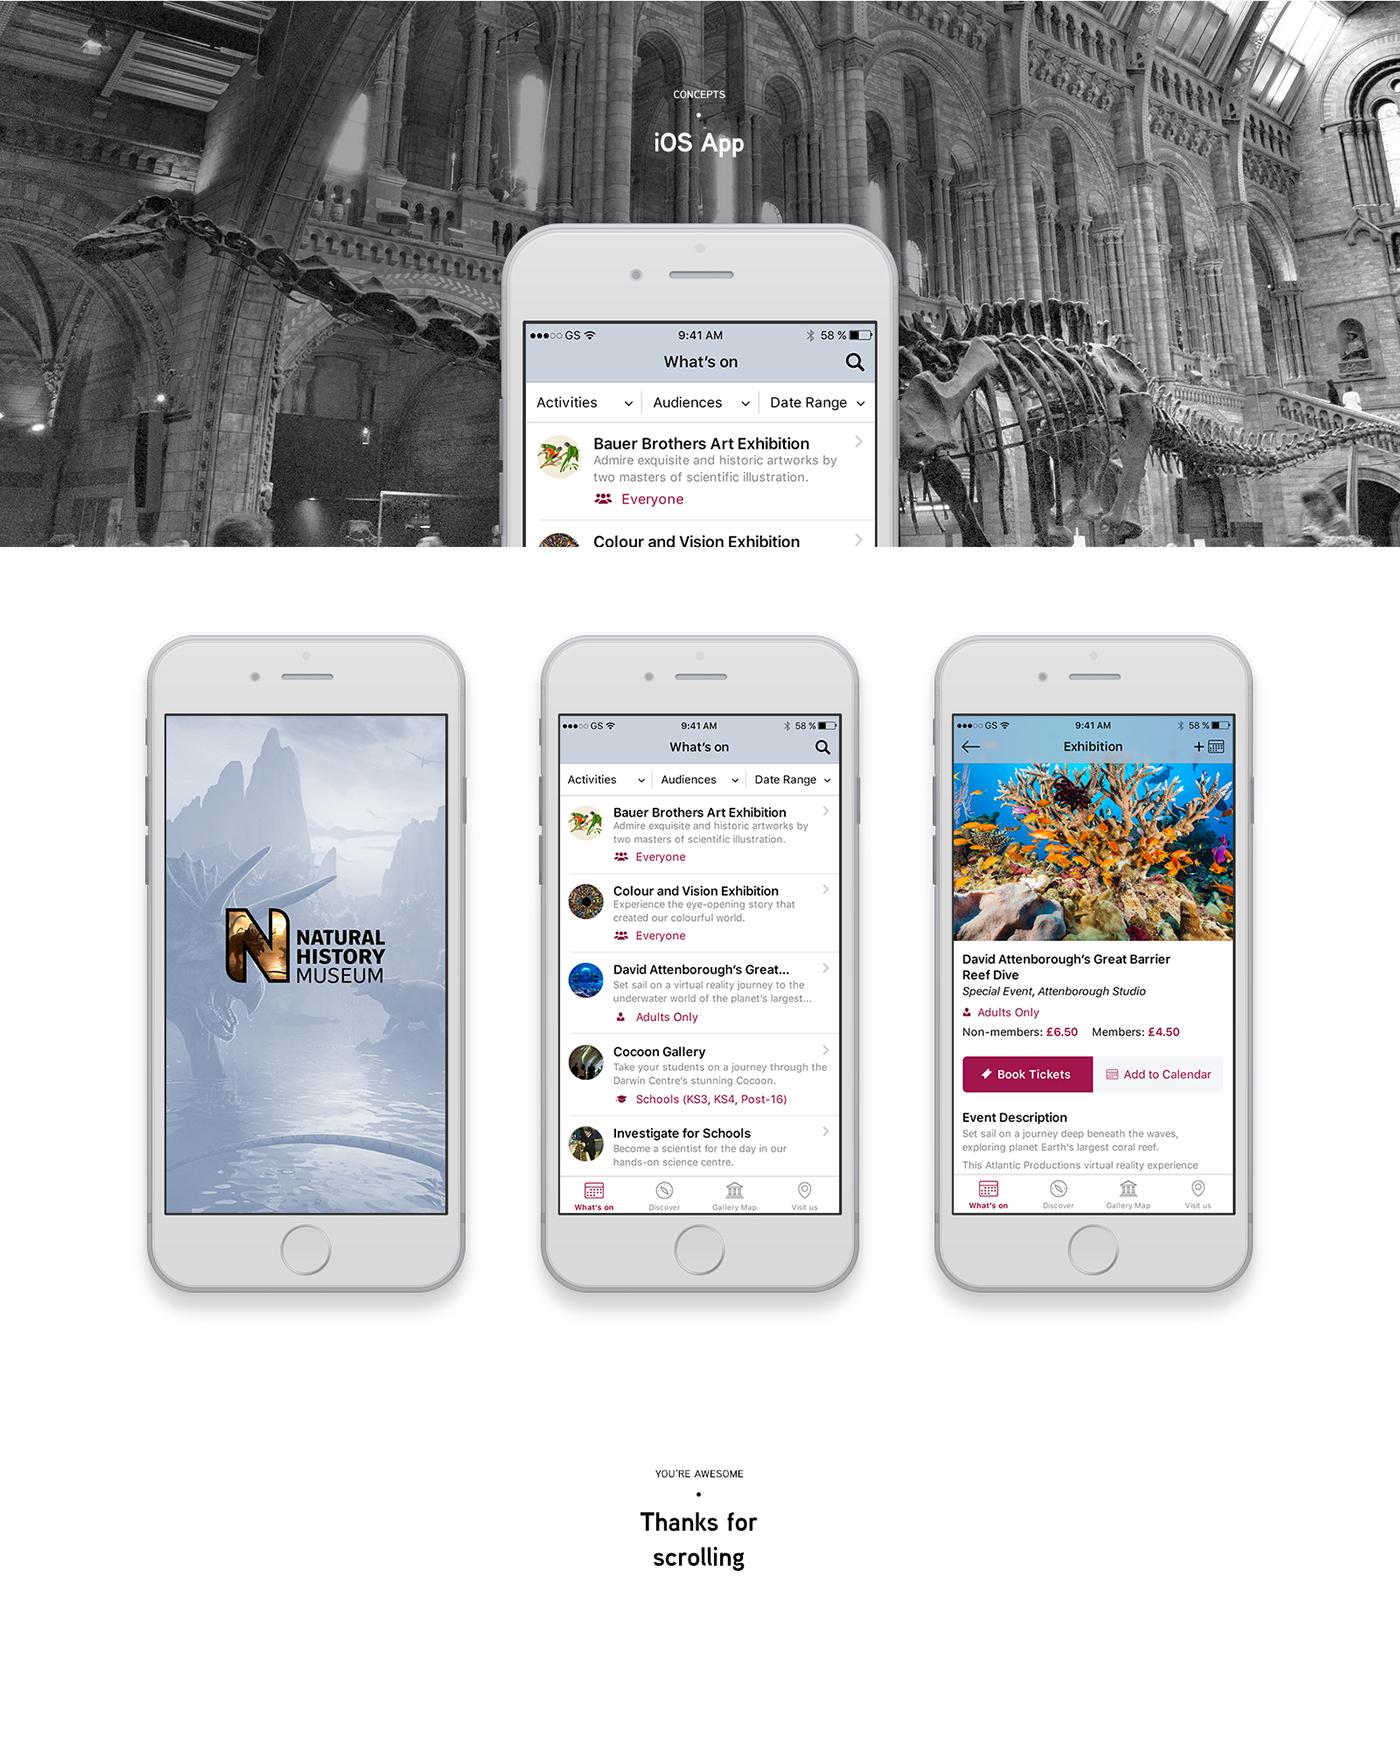 Website,concept,photoshop,natural history museum,Web Design ,ios,app,clean,minimalist,Education